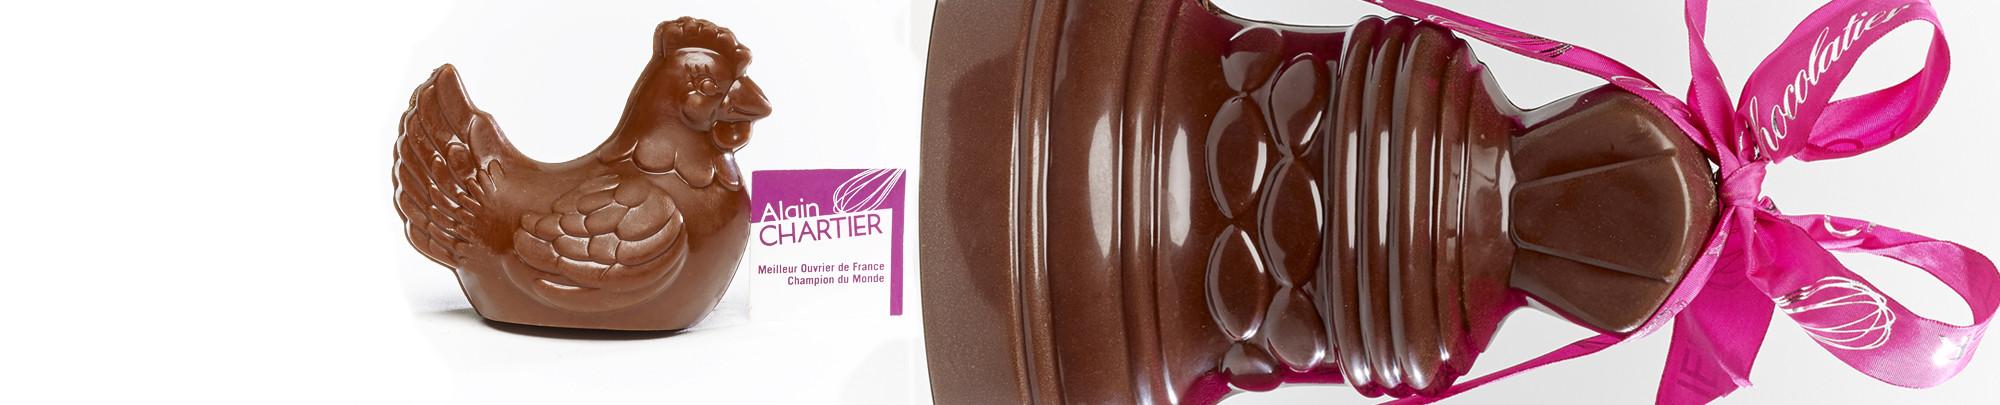 Les Cloches en chocolat